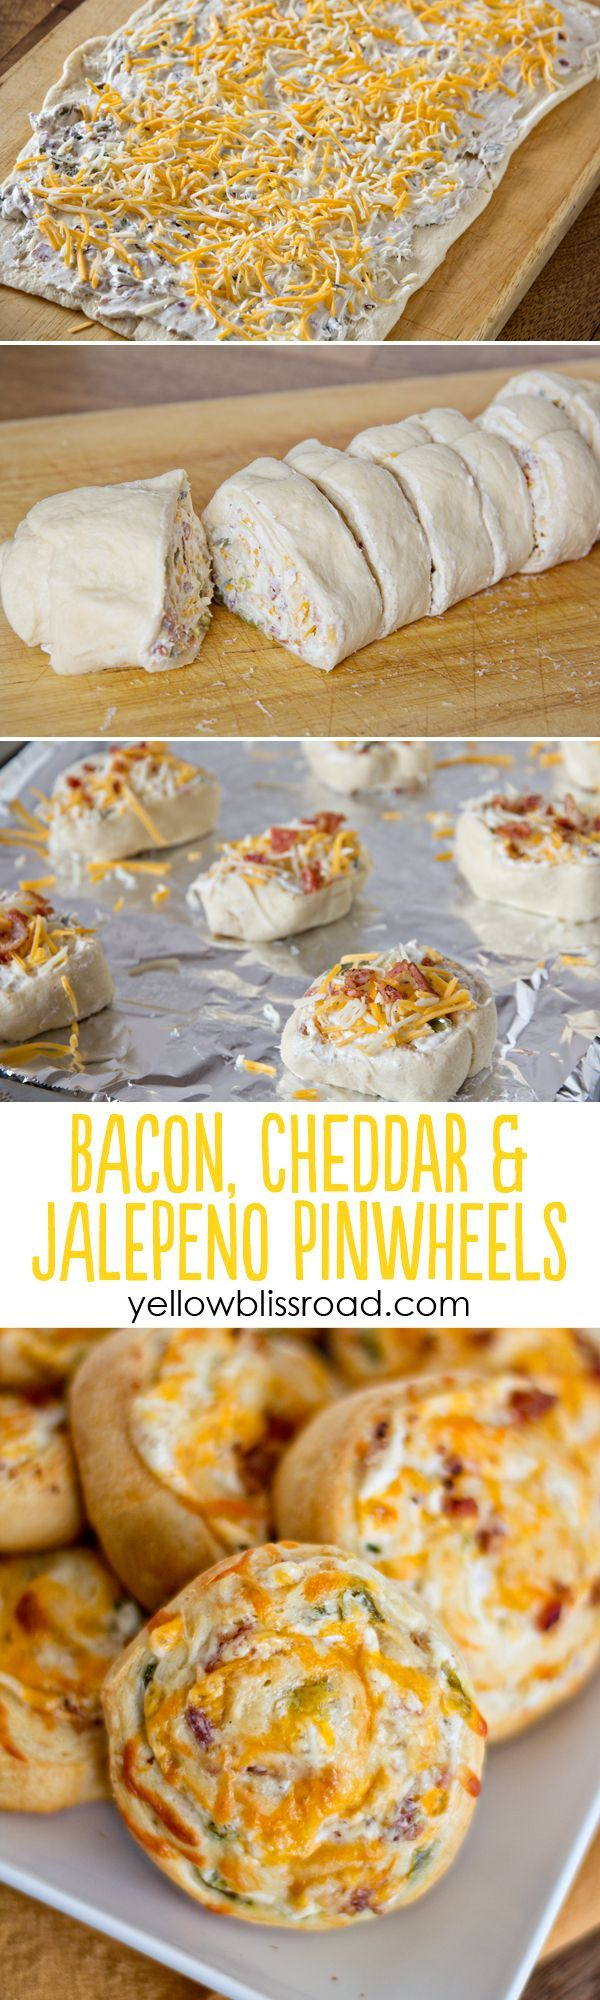 Bacon Cheddar Jalepeno Pinwheels collage